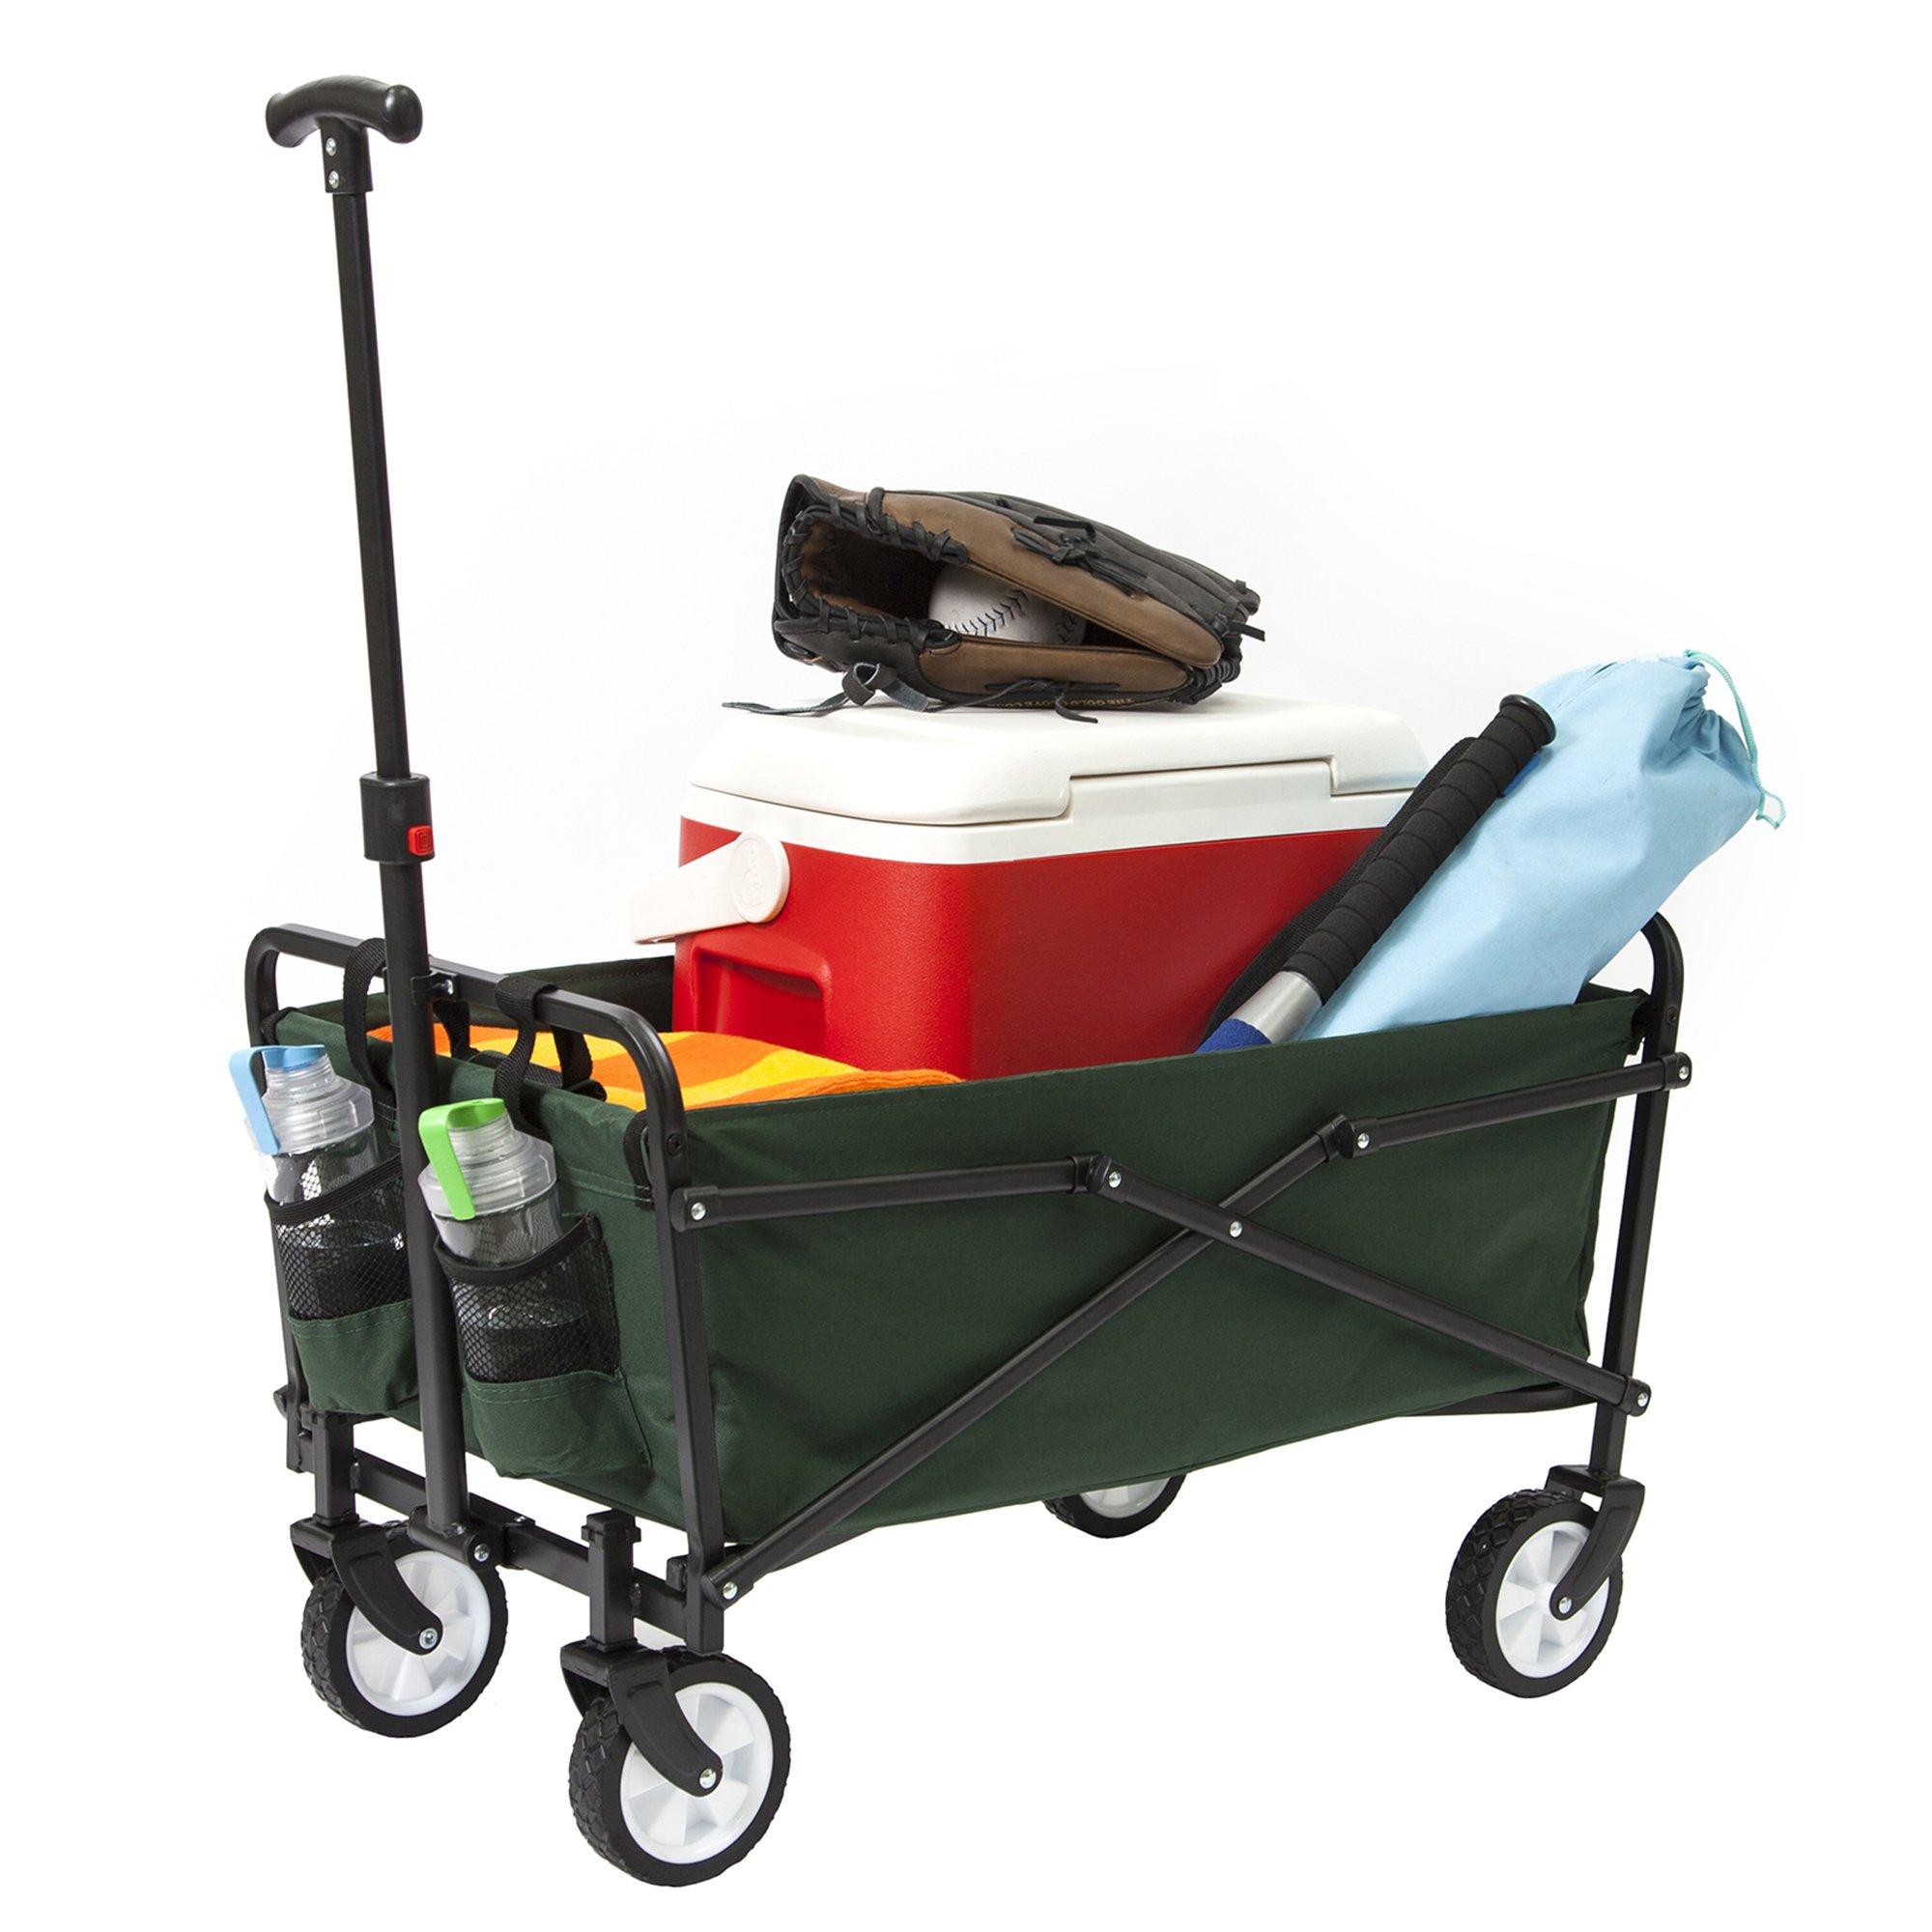 YSC Wagon Garden Folding Utility Shopping Cart,Beach (Green)